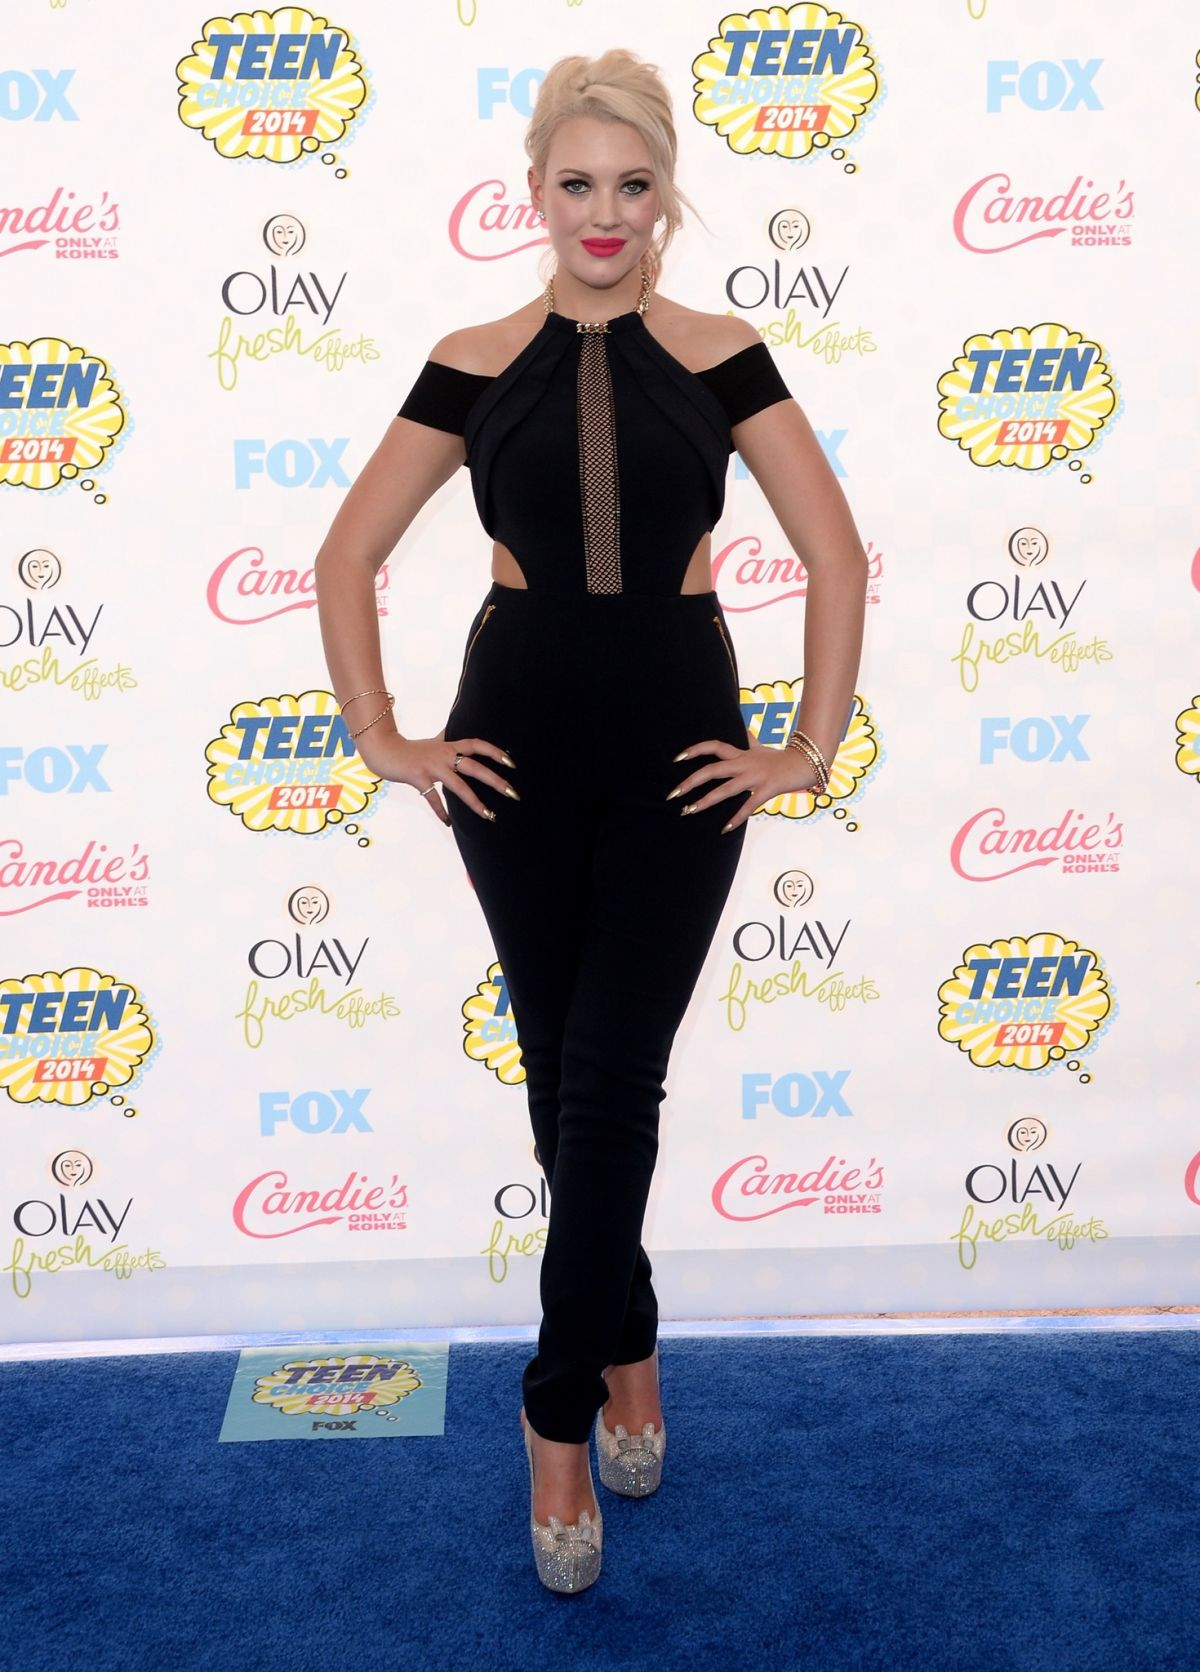 HAILET REESE at Teen Choice Awards 2014 in Los Angeles